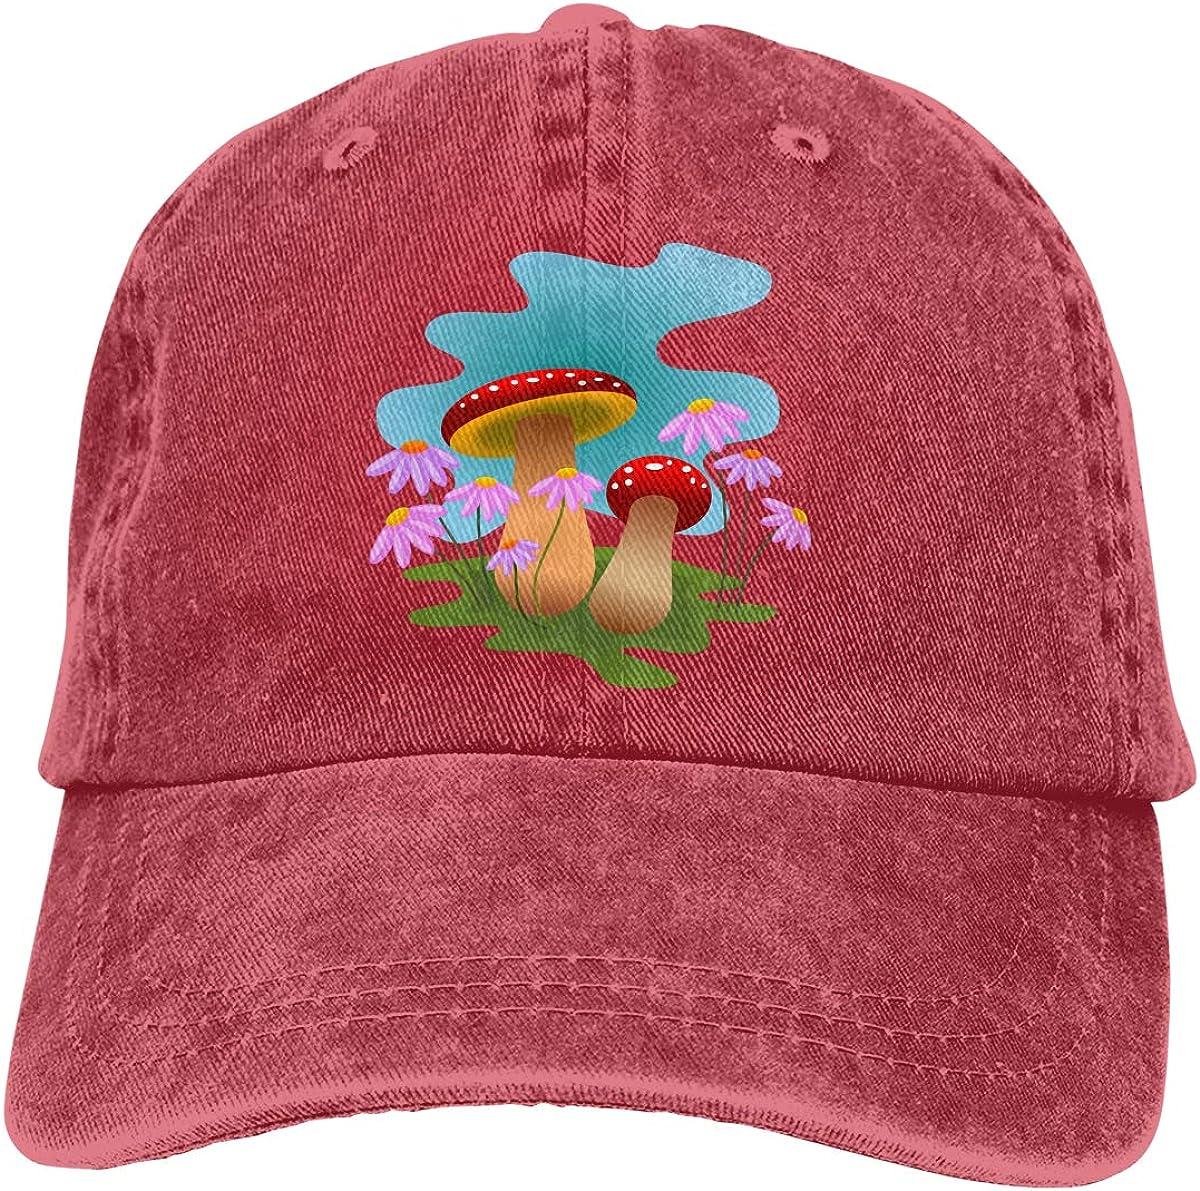 Colored Mushrooms Denim Hat Adjustable Plain Cap Baseball Caps